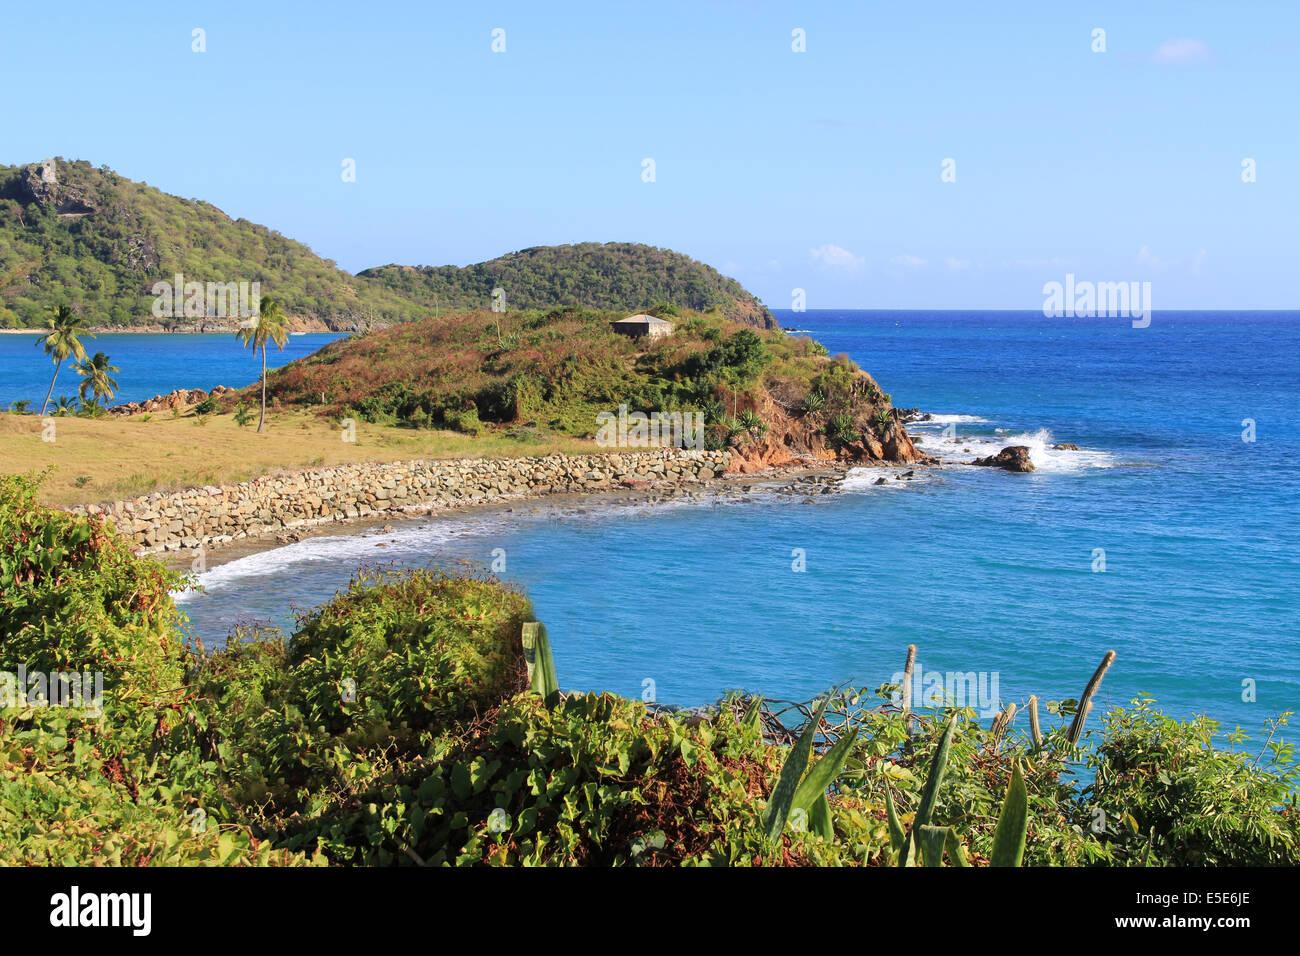 Barbuda Coastline Stock Photo, Royalty Free Image: 36554486 - Alamy